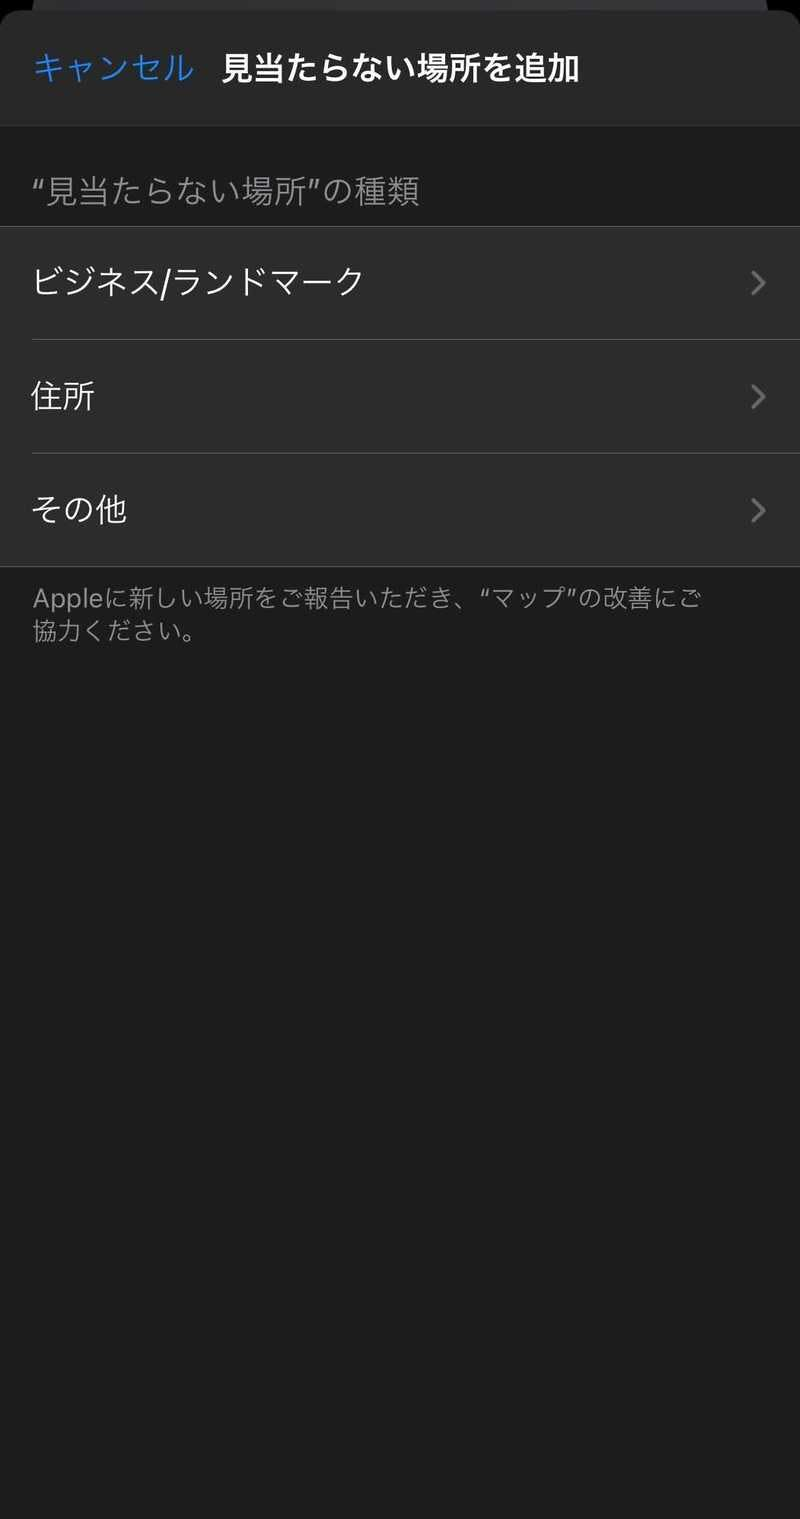 Apple Maps ユーザー 場所 登録